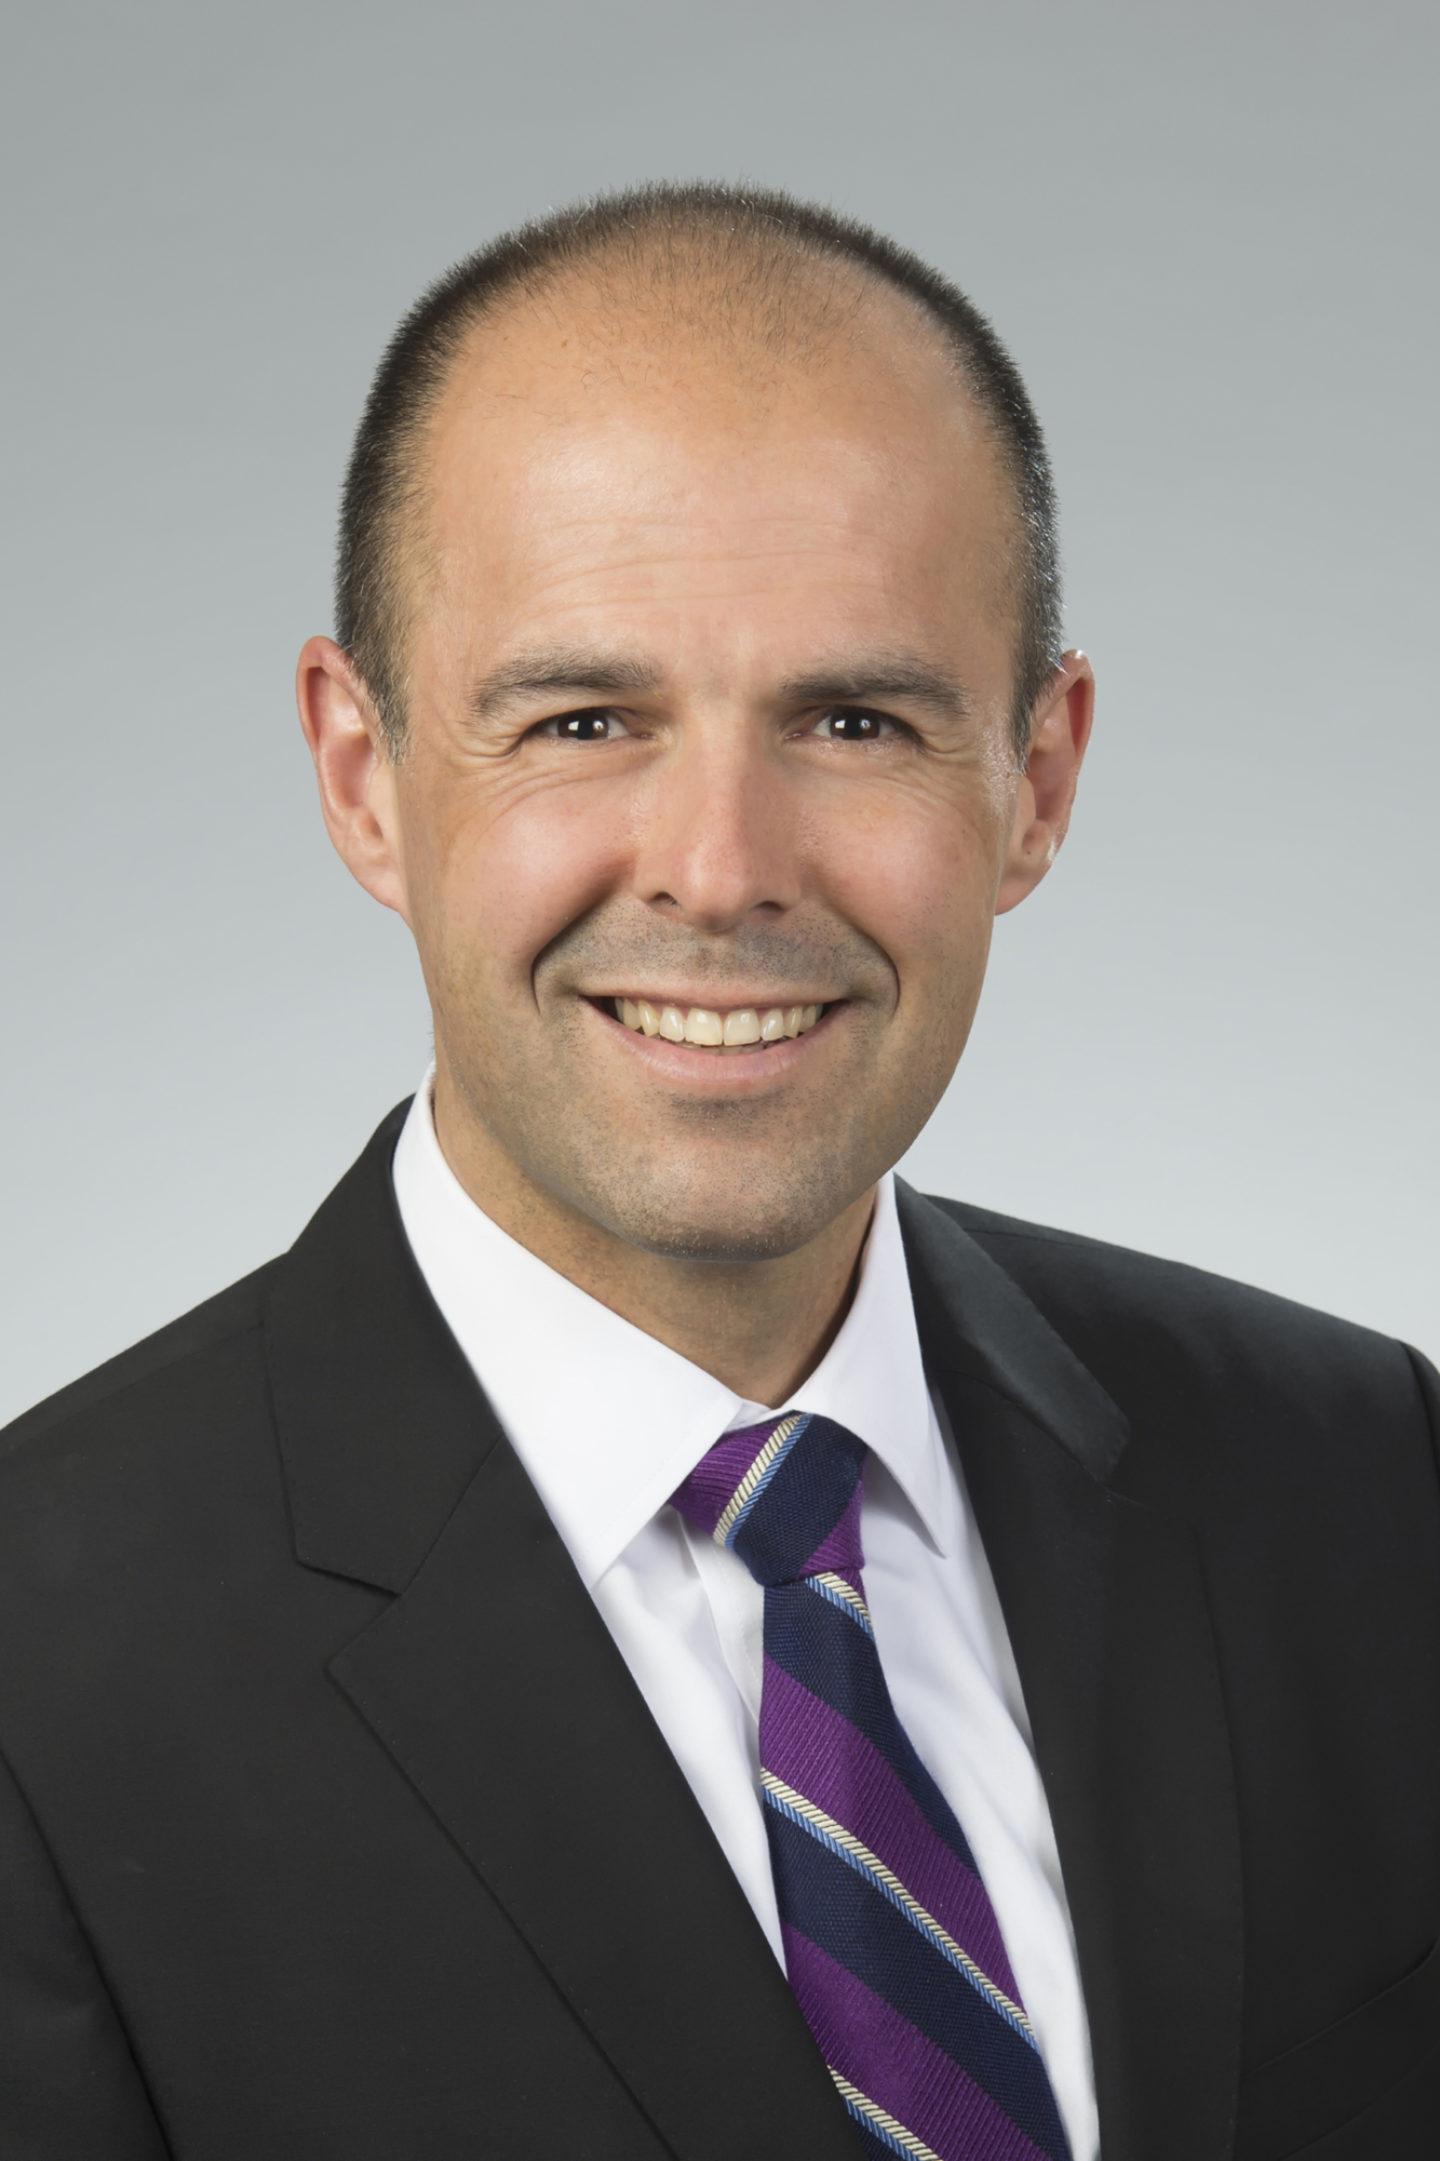 Paul Medeiros headshot